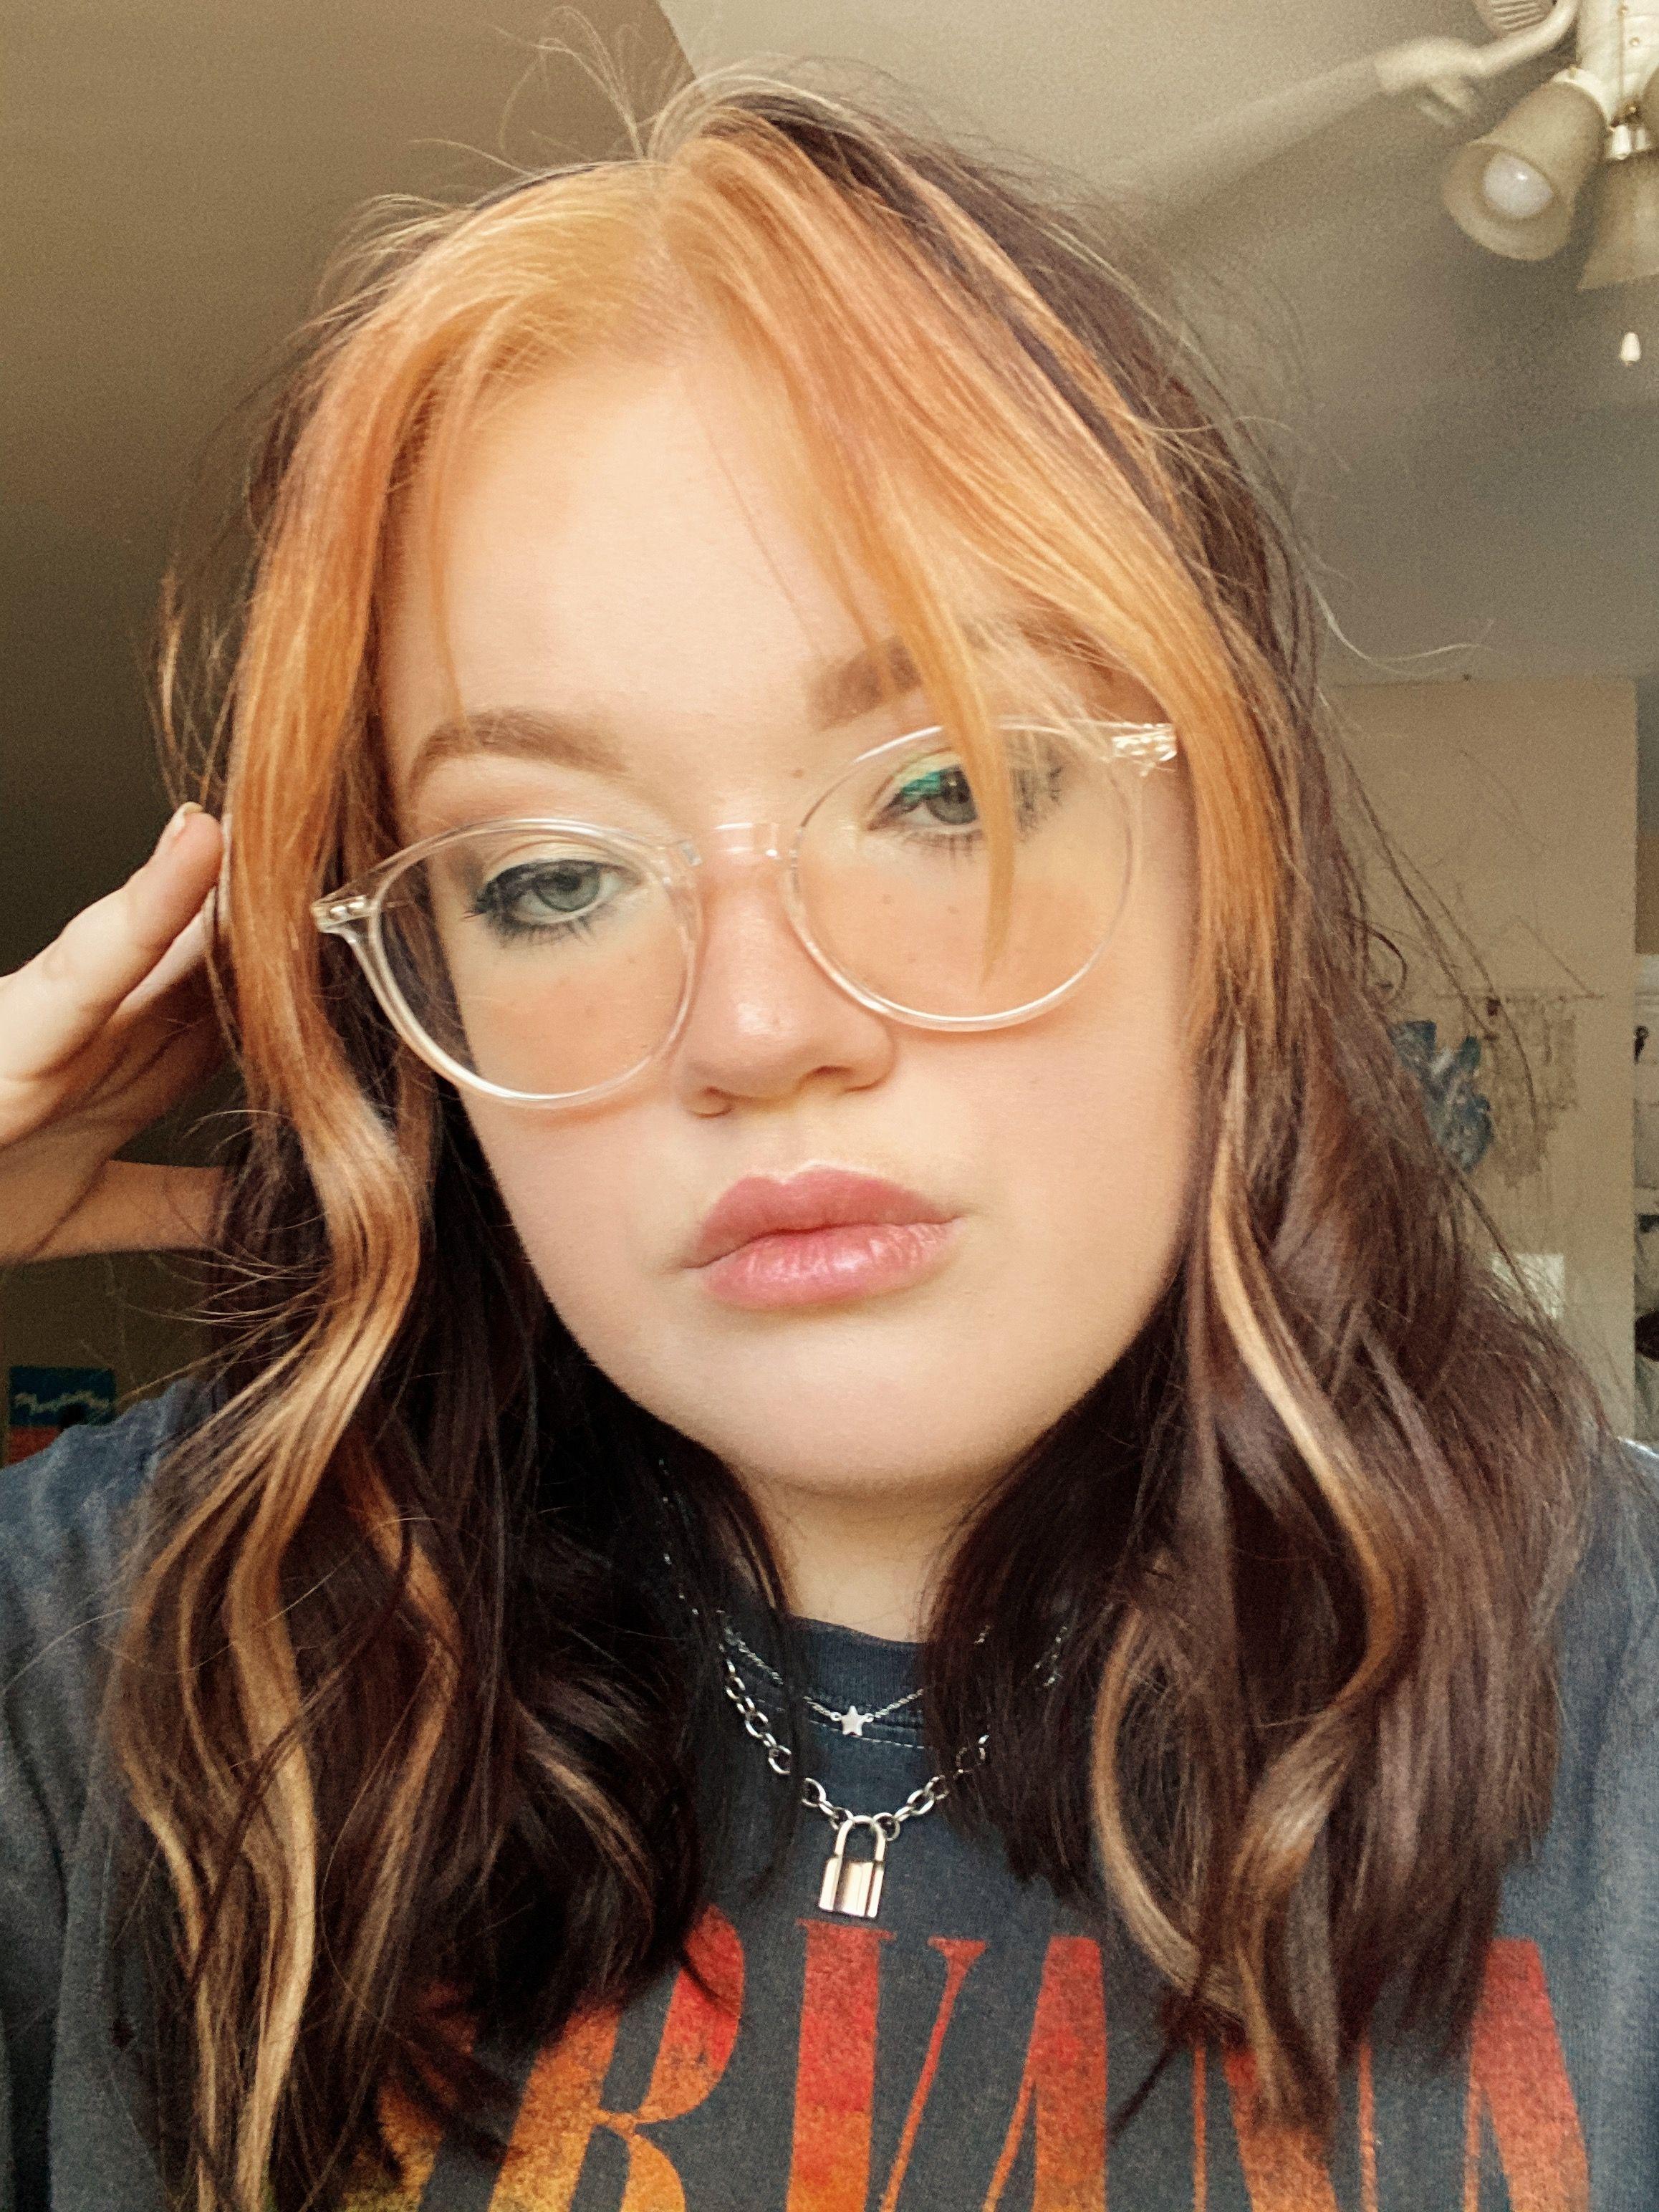 Egirl Hair Streaks In 2020 Edgy Hair Hair Streaks Curly Hair Styles